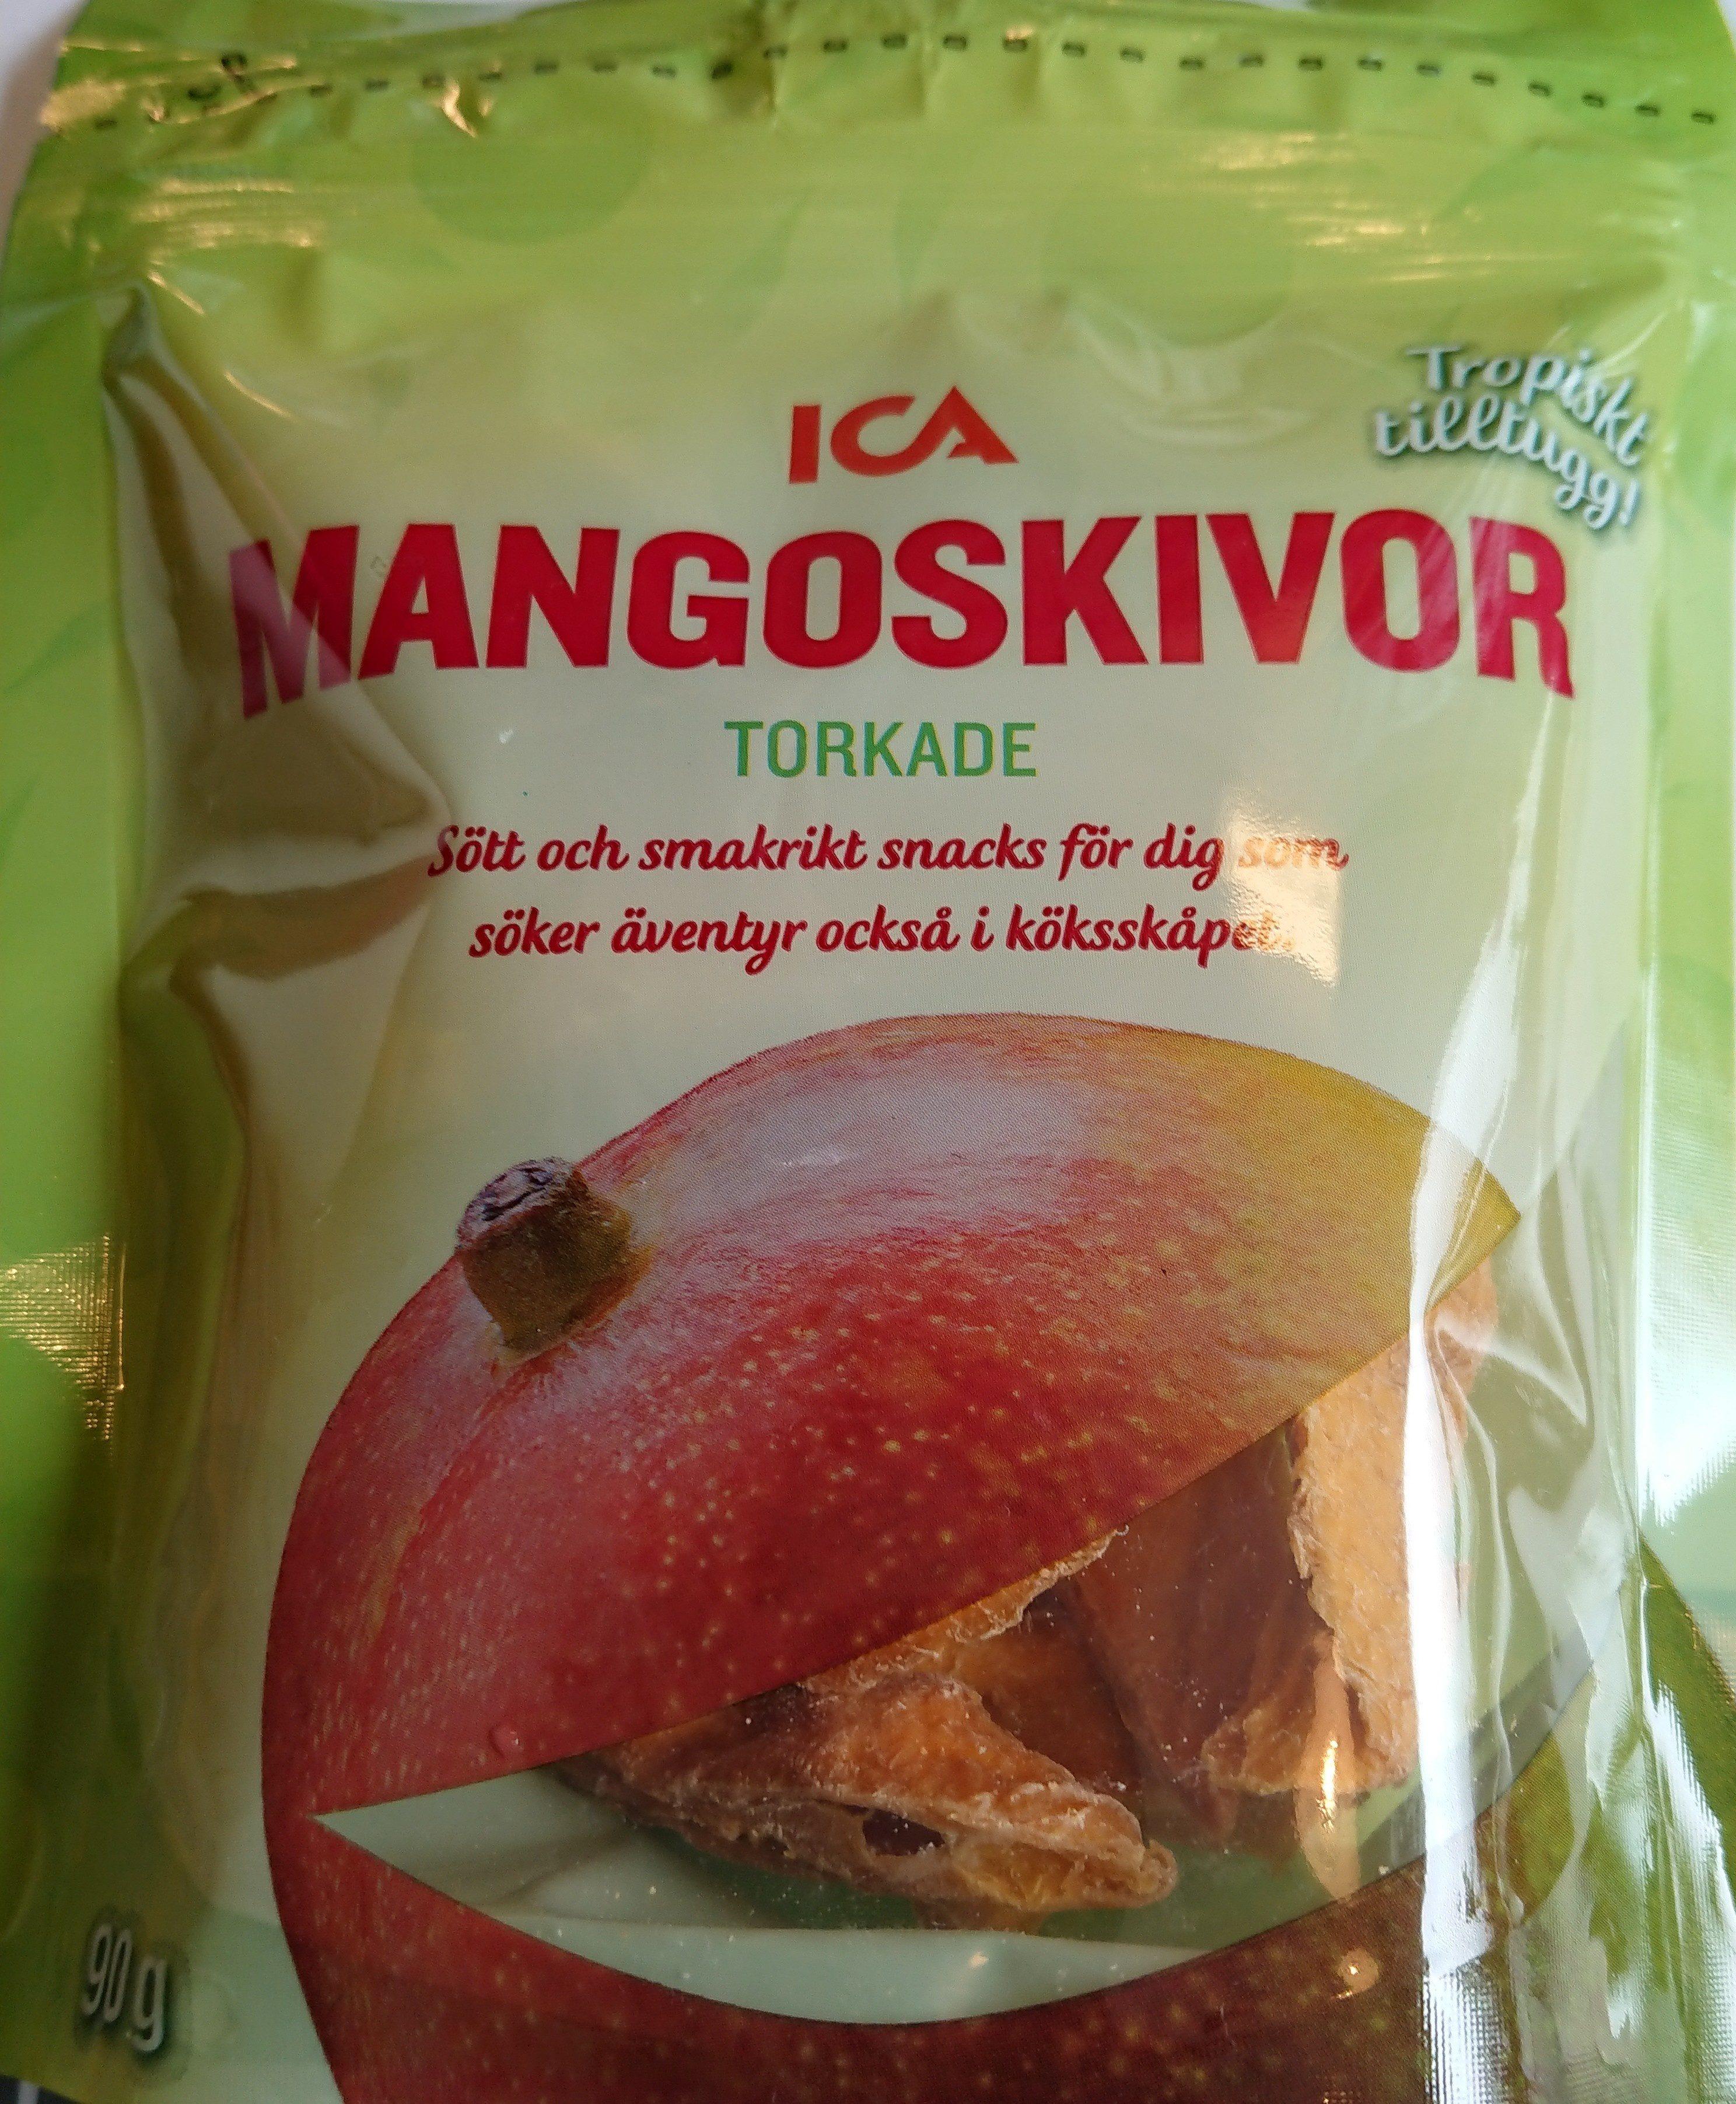 Mangoskivor - Product - en